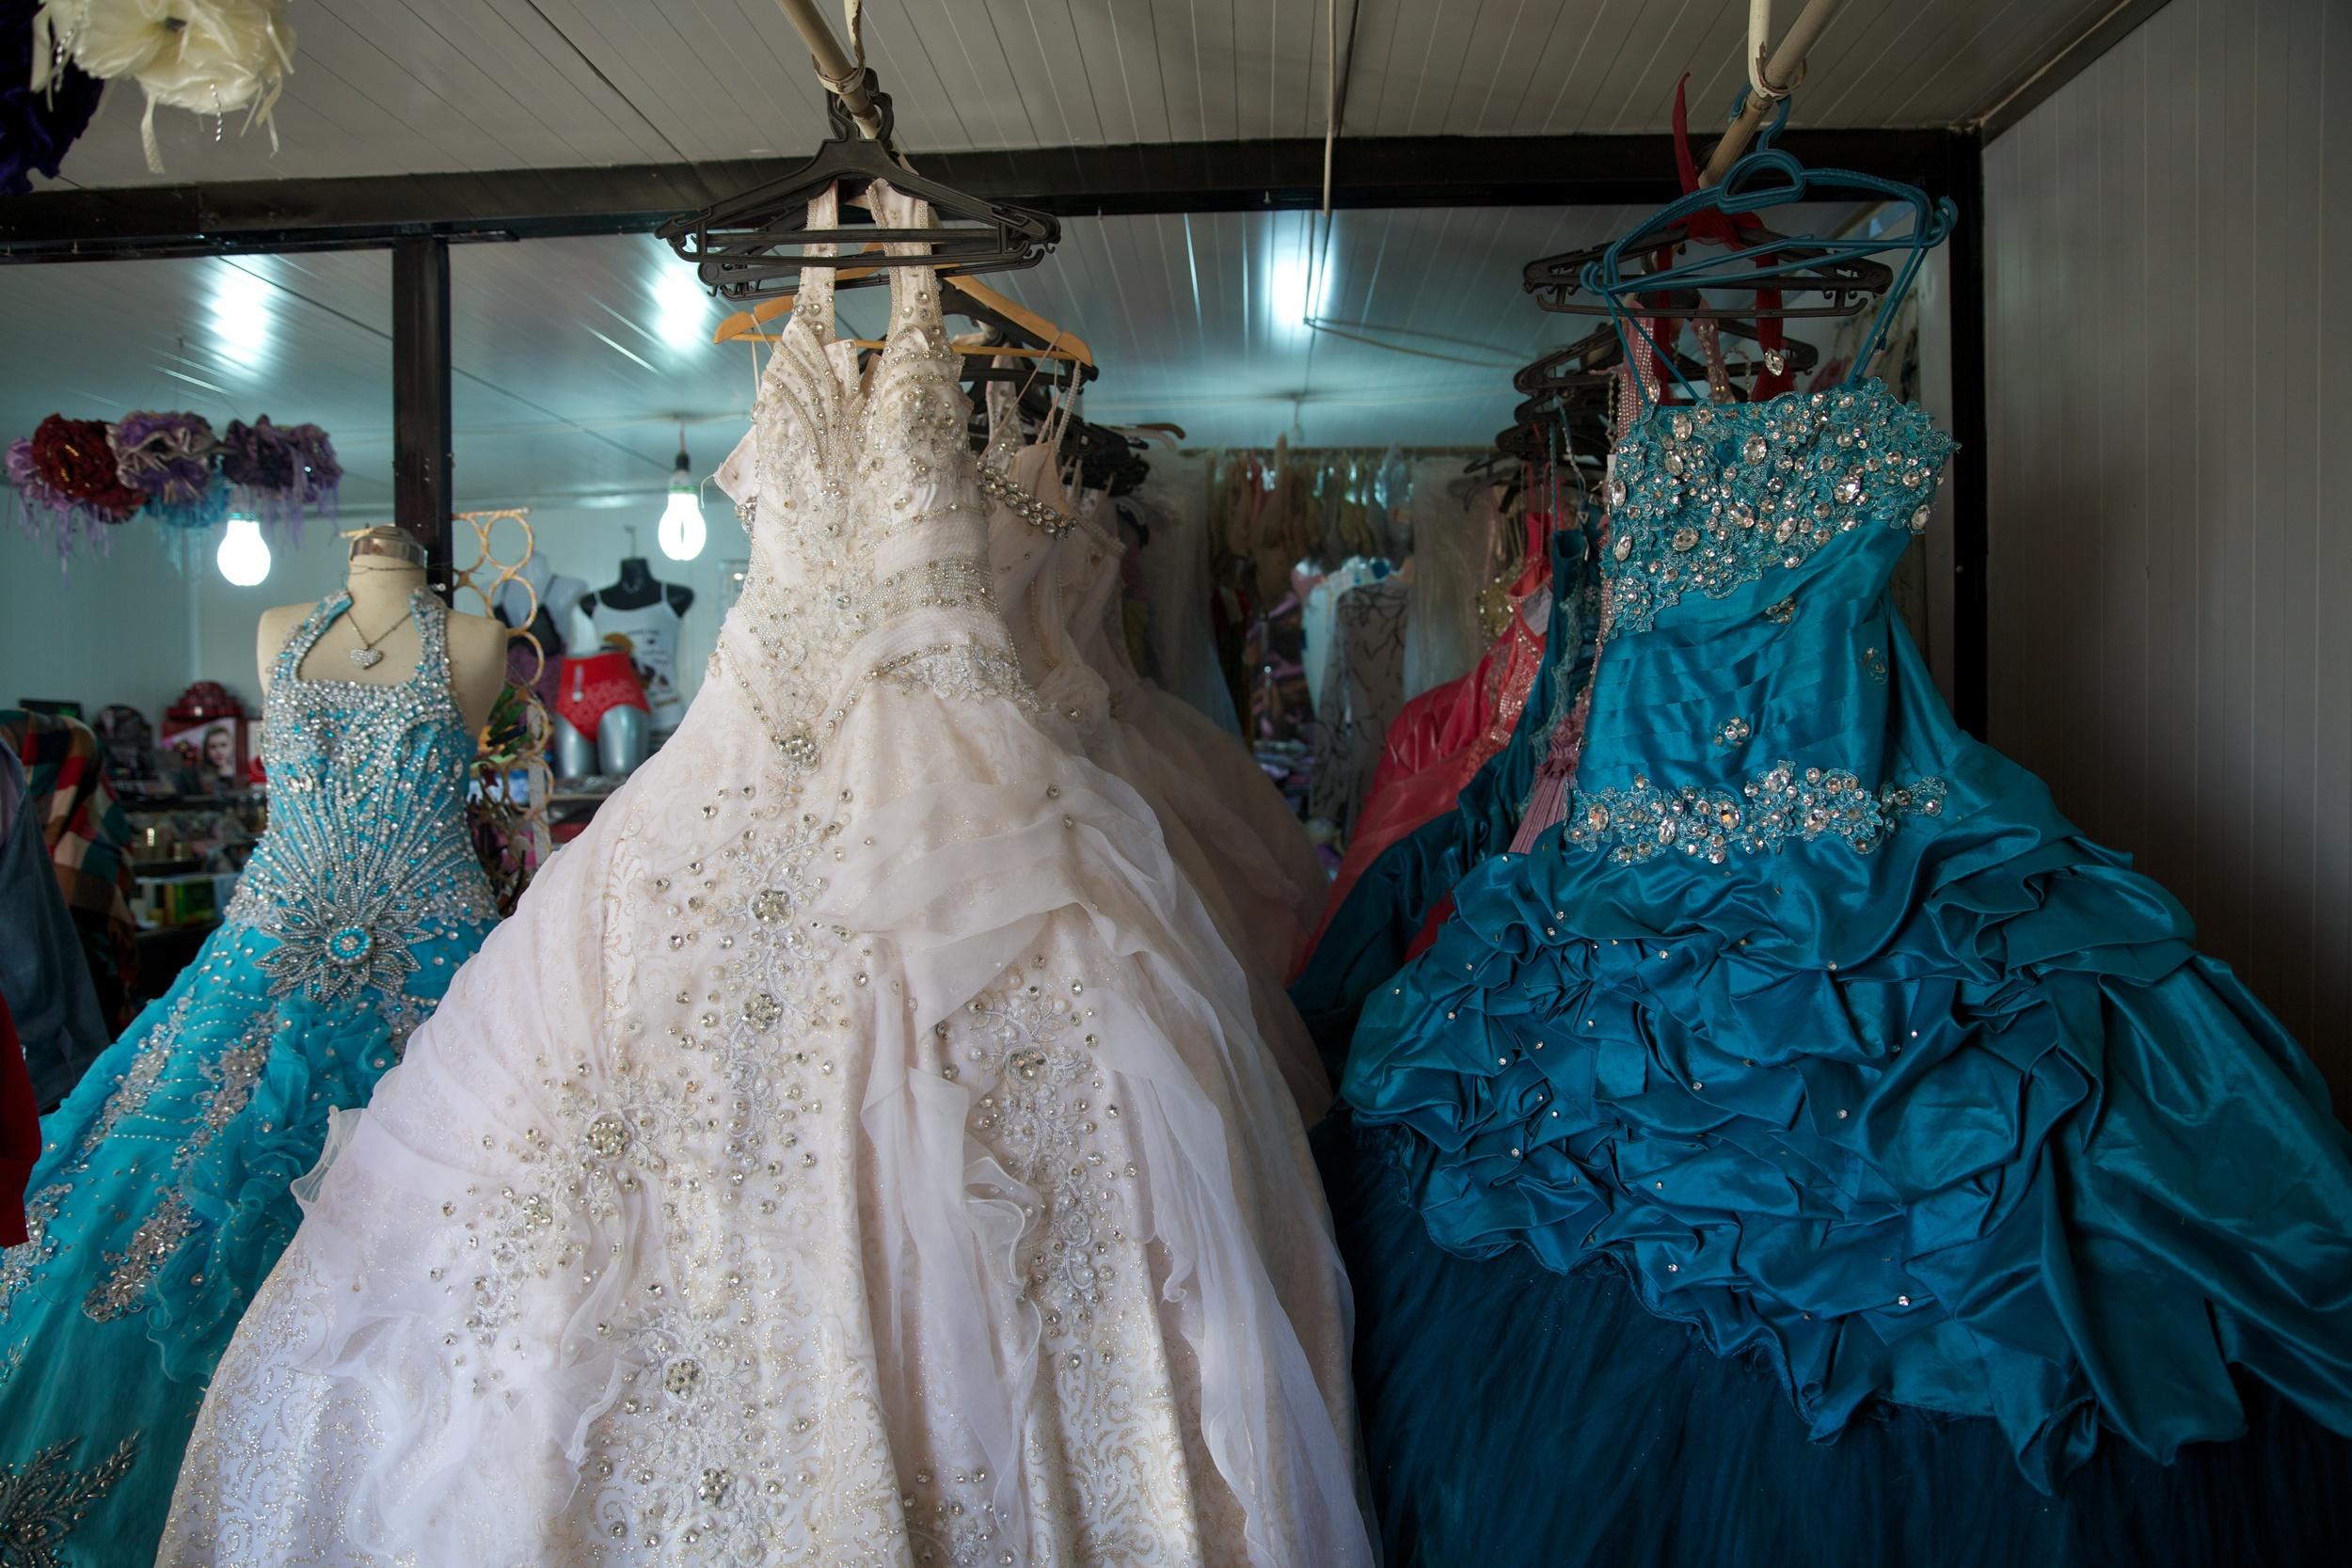 Wedding dresses for rent inside Zaatari refugee camp in Jordan.